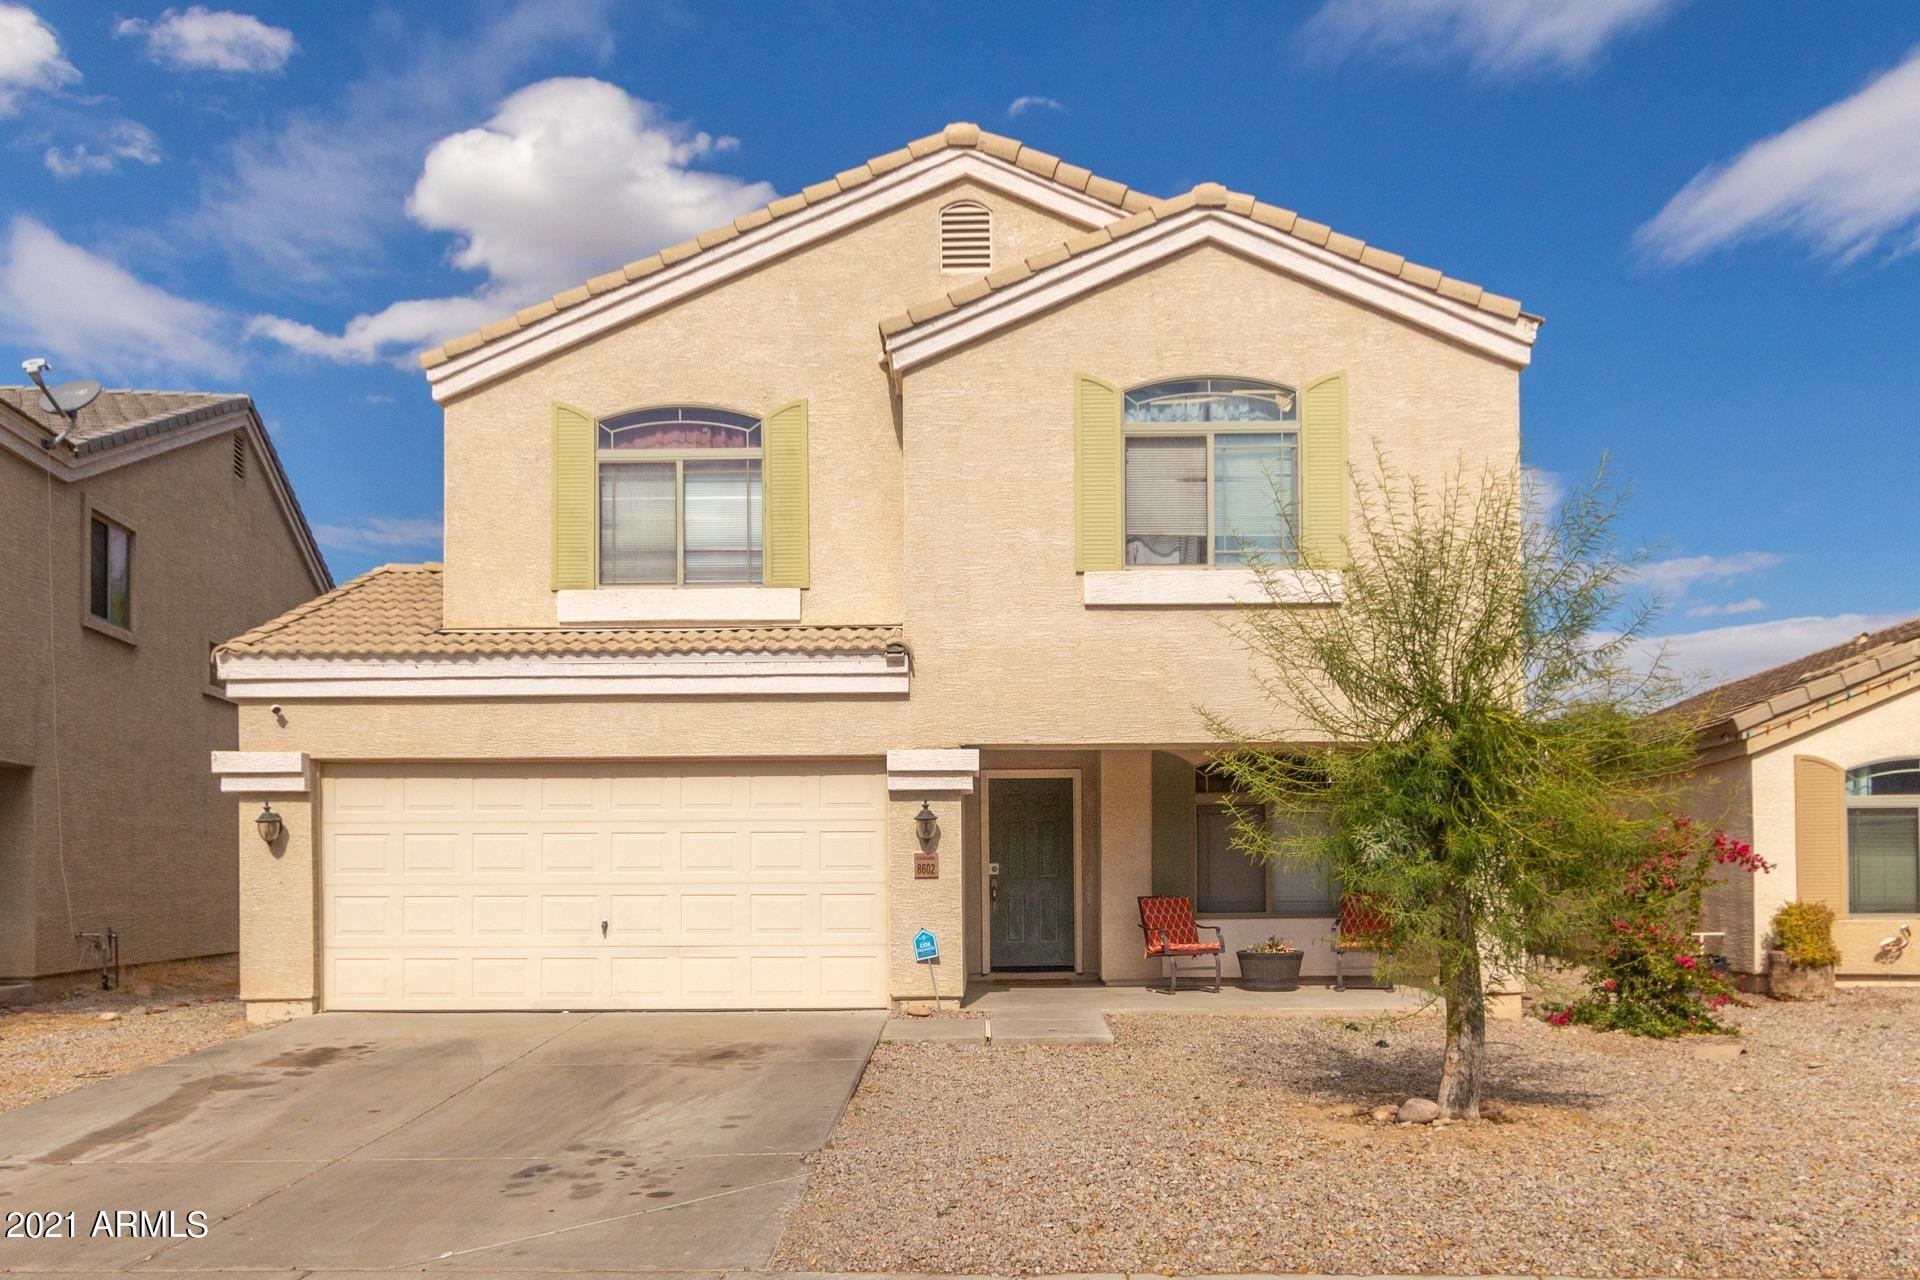 Photo of 8602 W KINGMAN Street, Tolleson, AZ 85353 (MLS # 6195408)